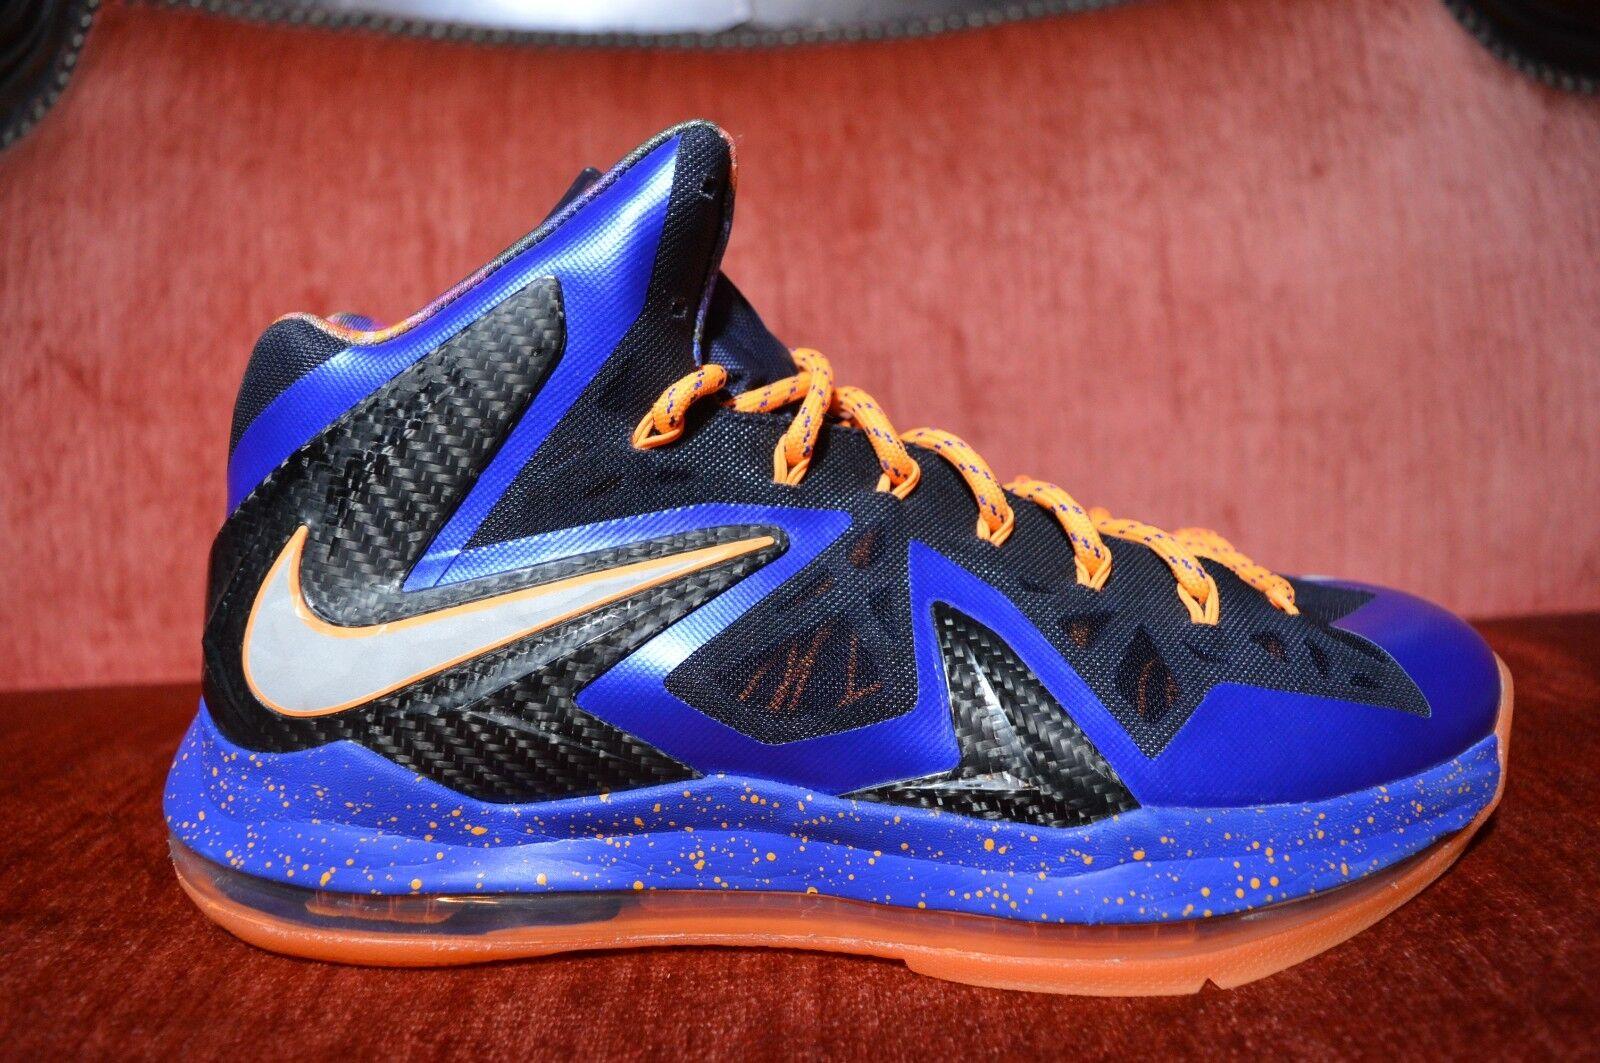 WORN TWICE Nike Lebron 10 X Elite Superhero Size 10 Men's Basketball shoes Super